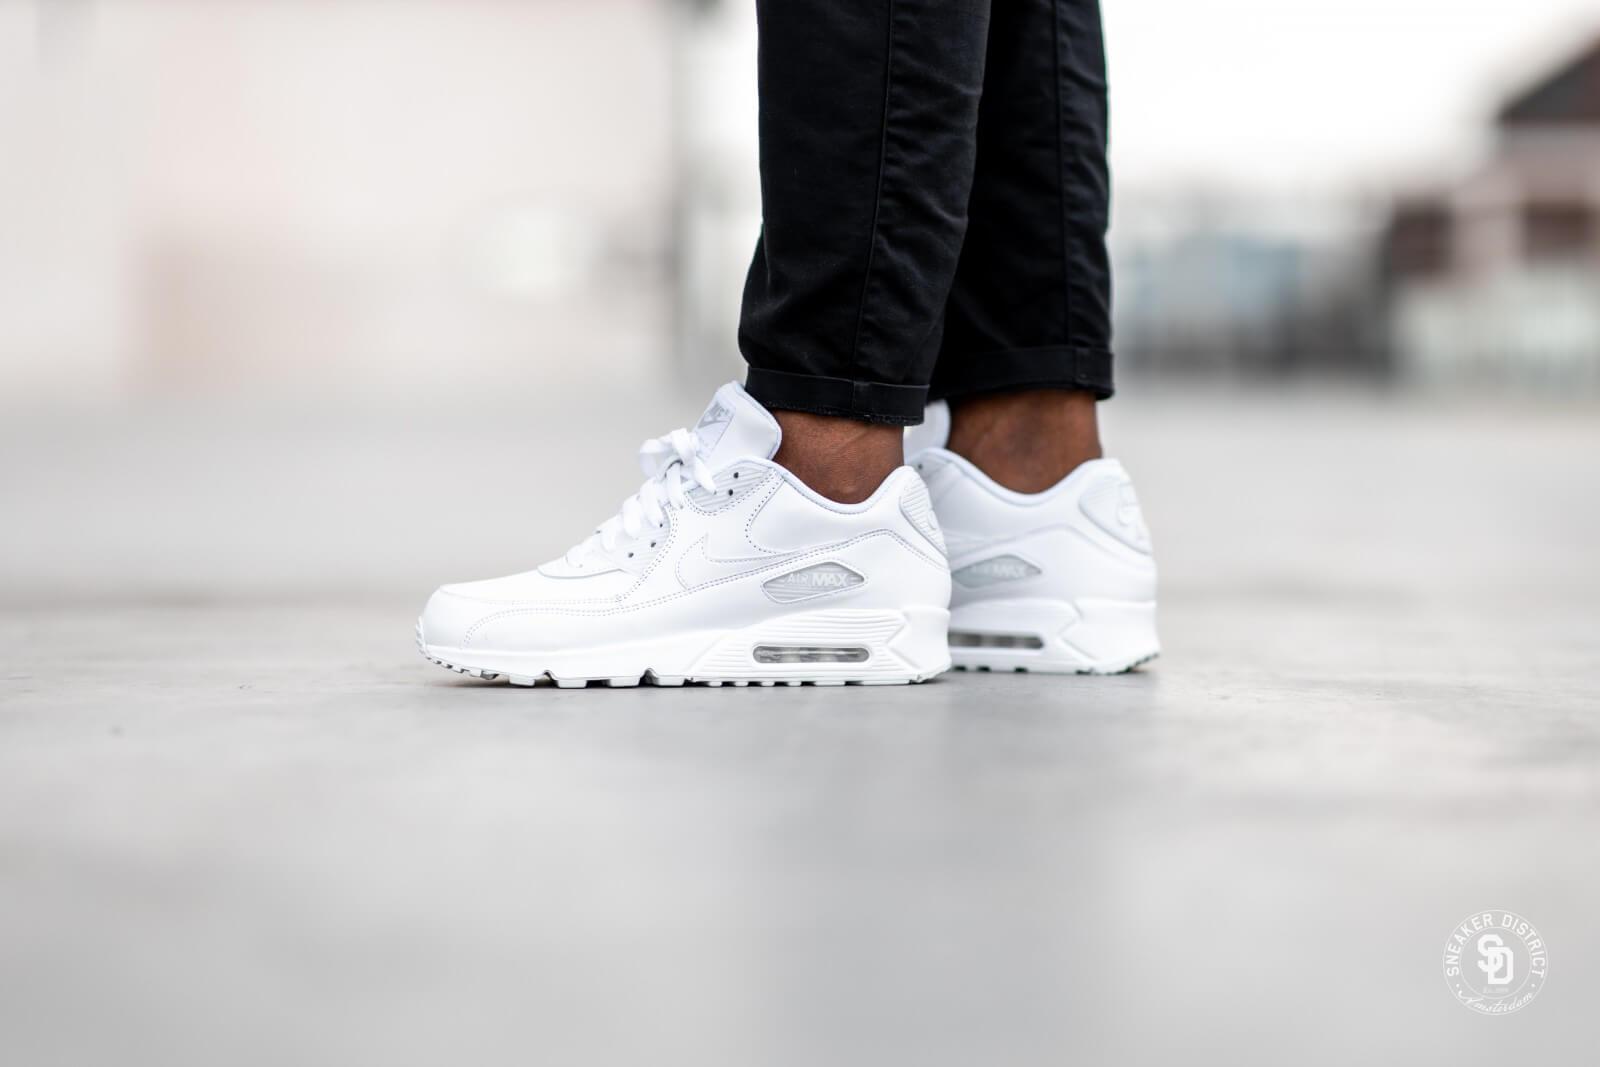 Nike Air Max 90 Leather White 302519 113 Purchaze